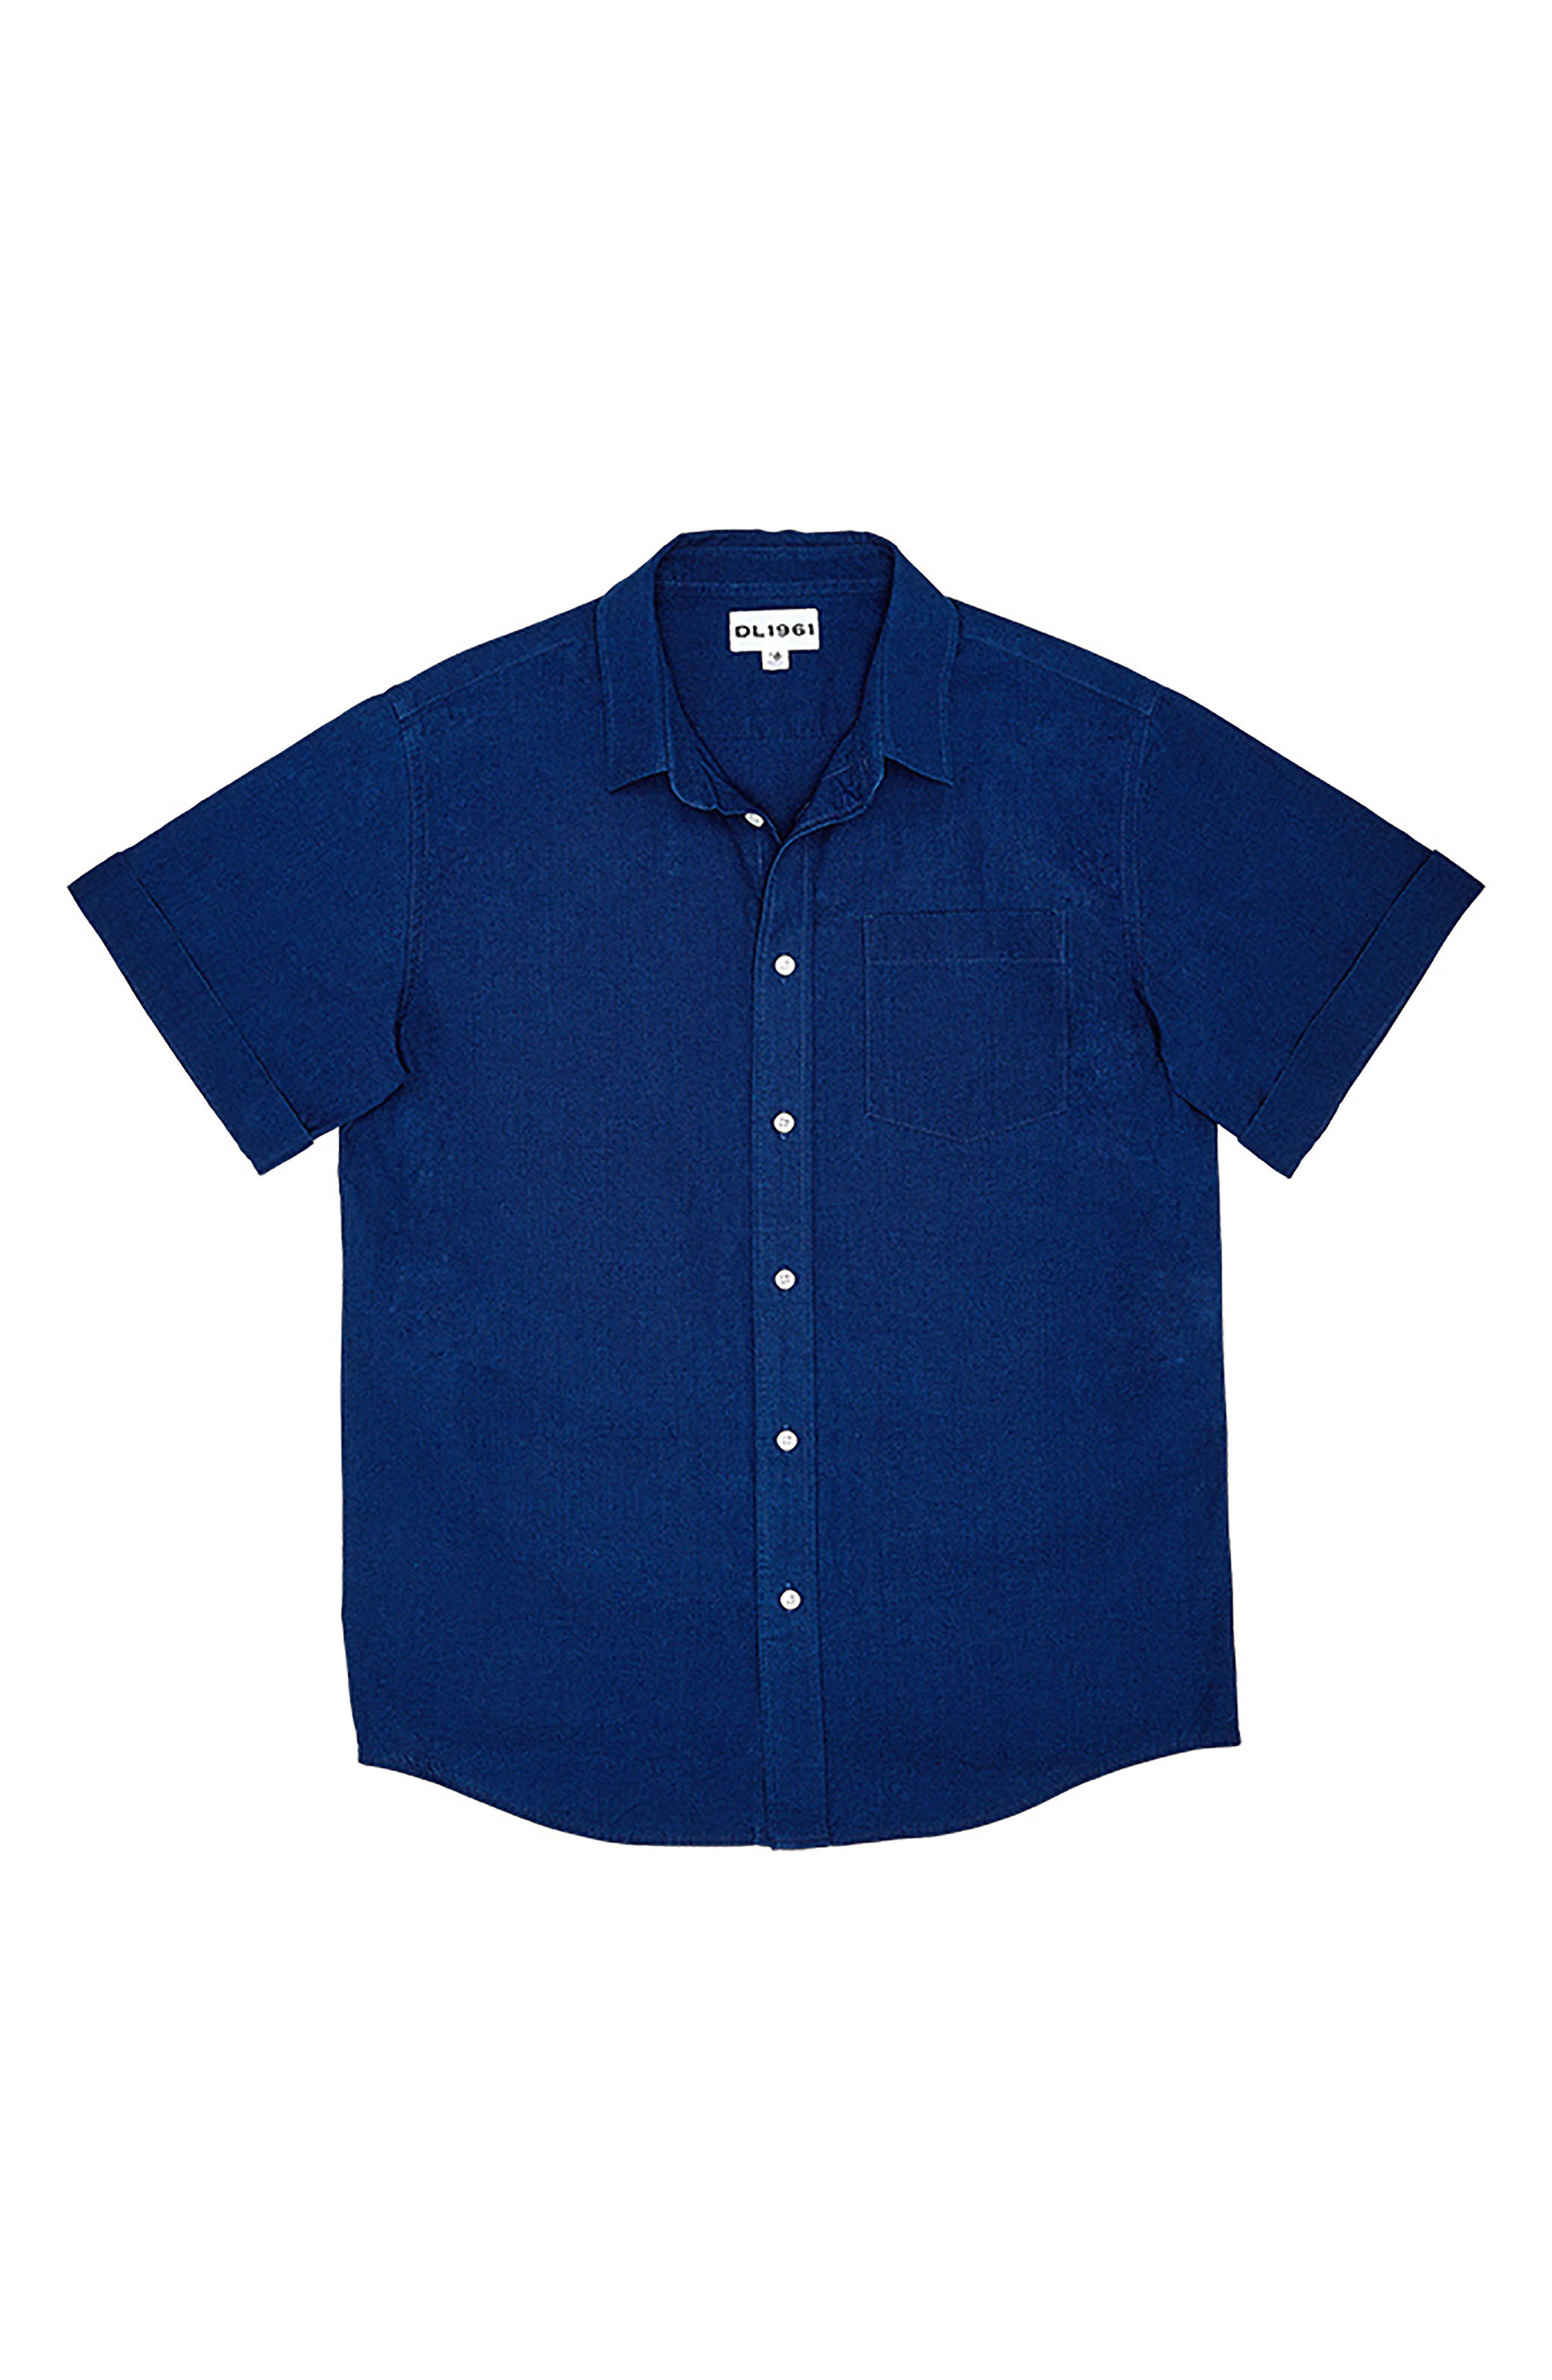 DL 1961 Ash Woven Shirt,                         Main,                         color, Indigo Plaid